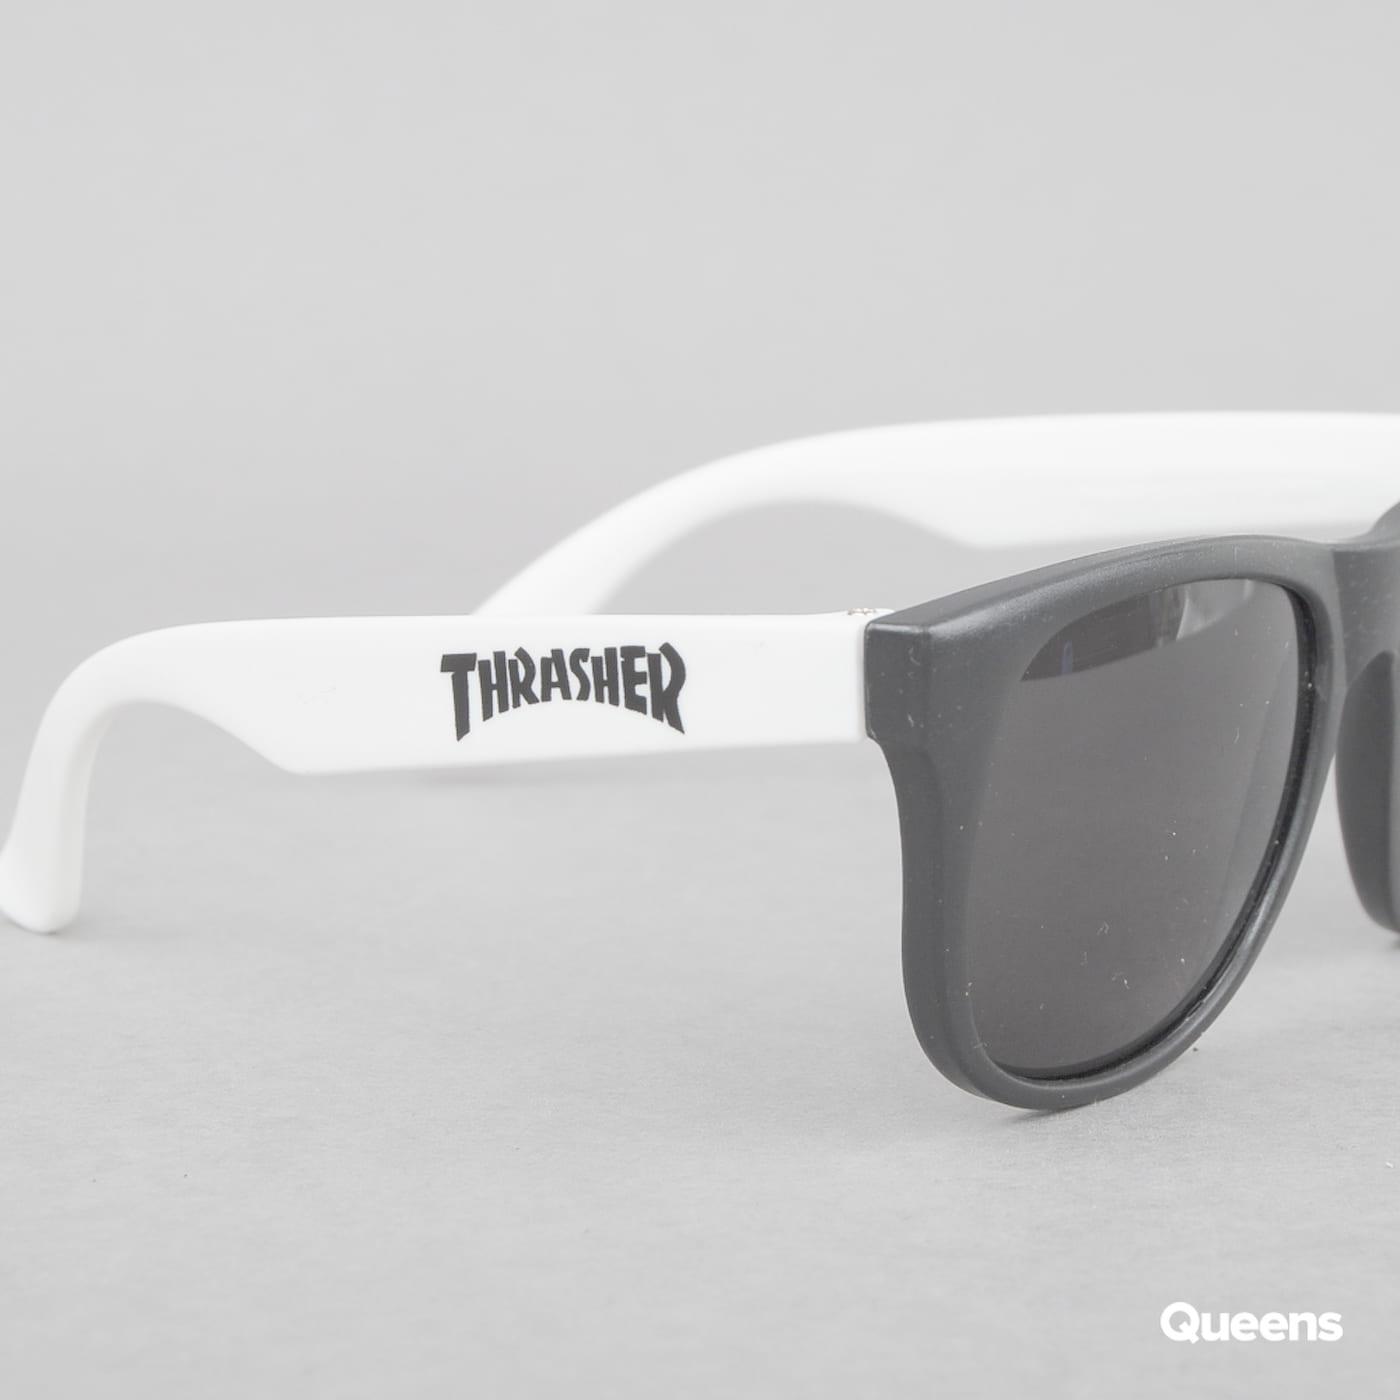 Thrasher Thrasher Sunglasses schwarz / weiß